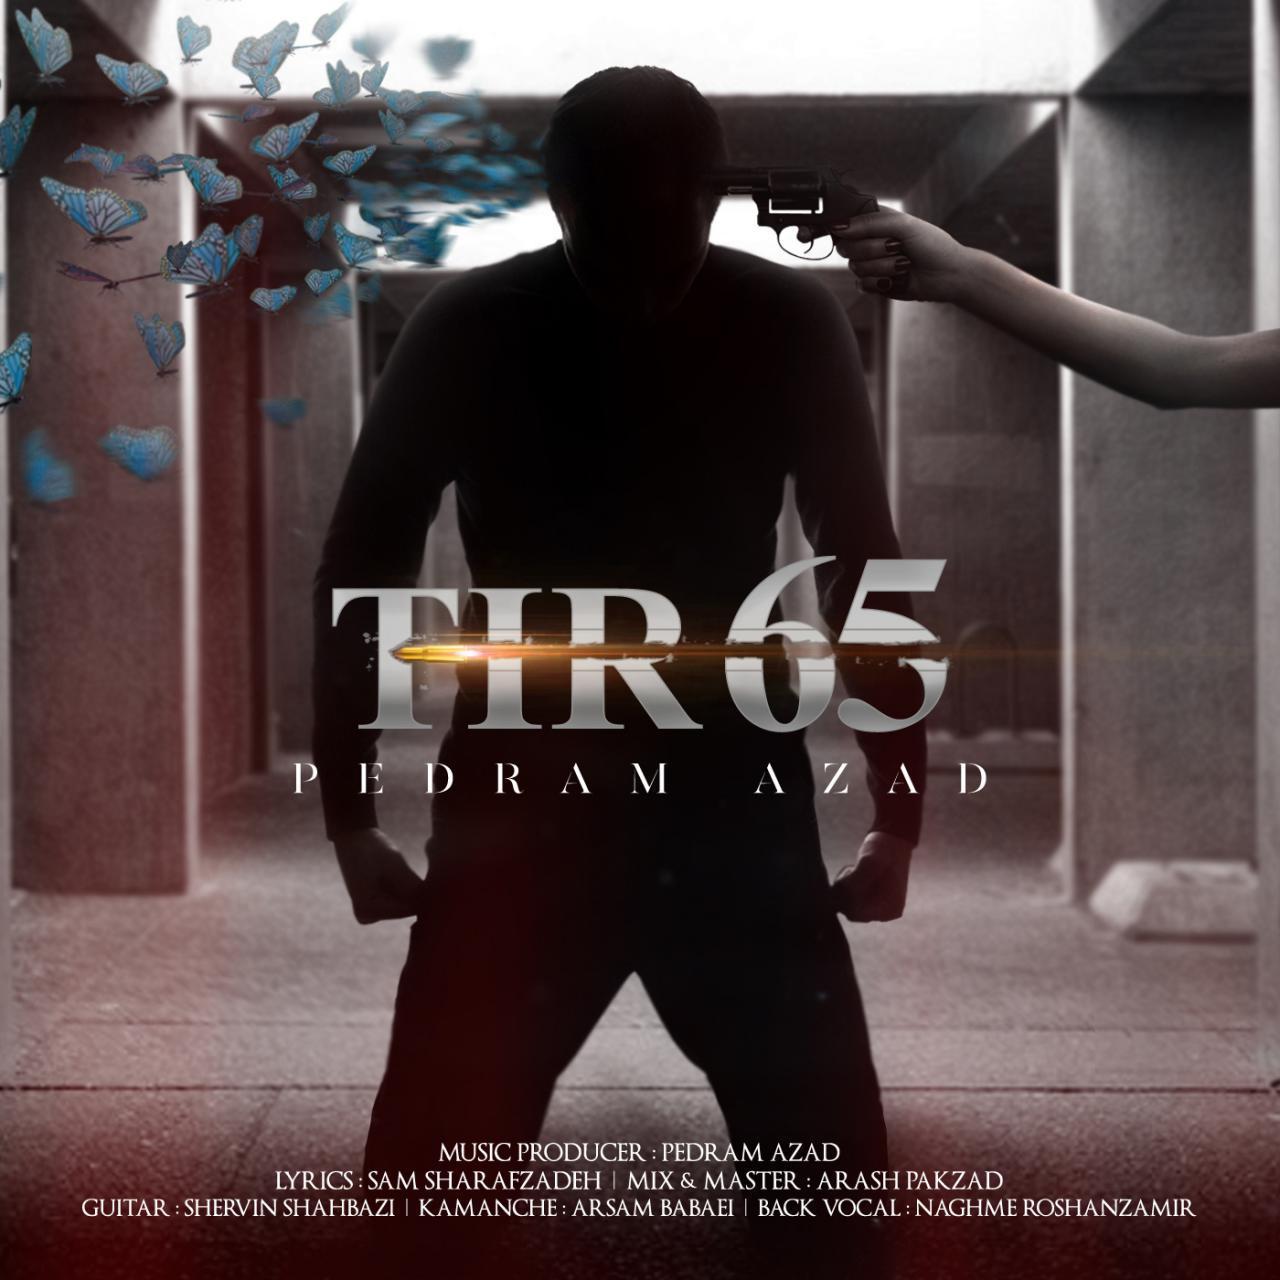 Pedram Azad – Tir 65